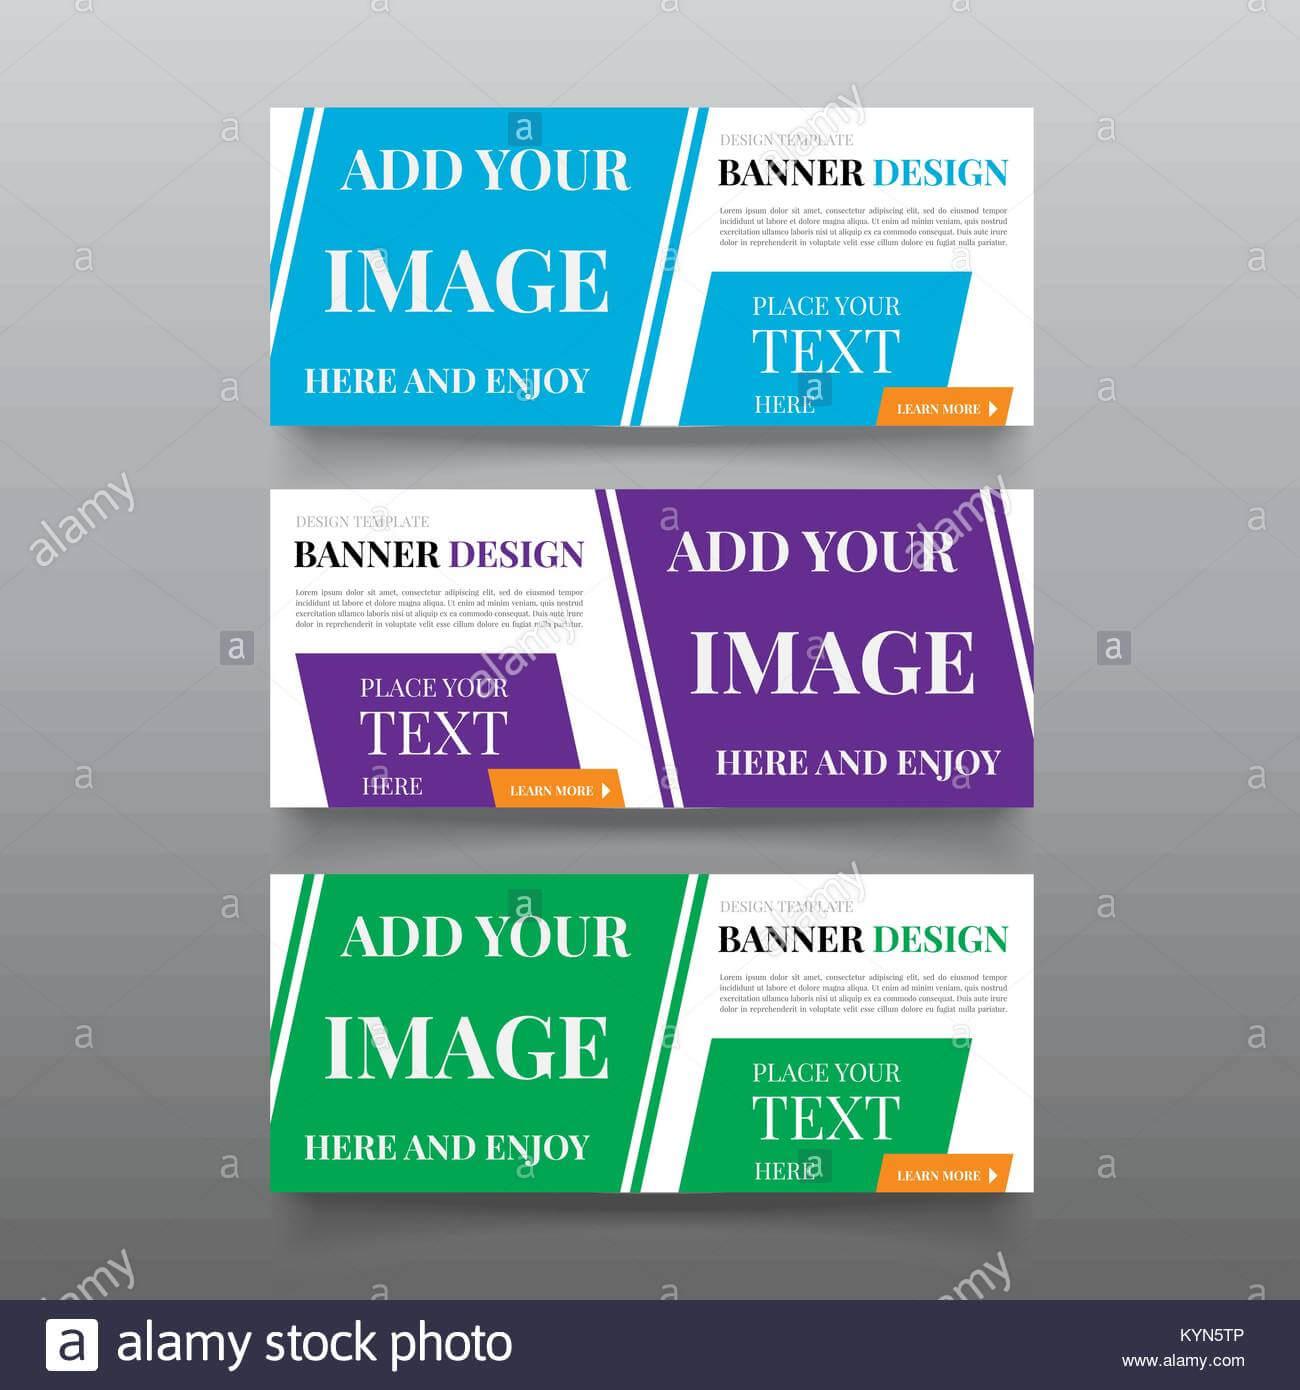 Diagonal Banner Design Templates. Web Banner Design Vector In Website Banner Design Templates